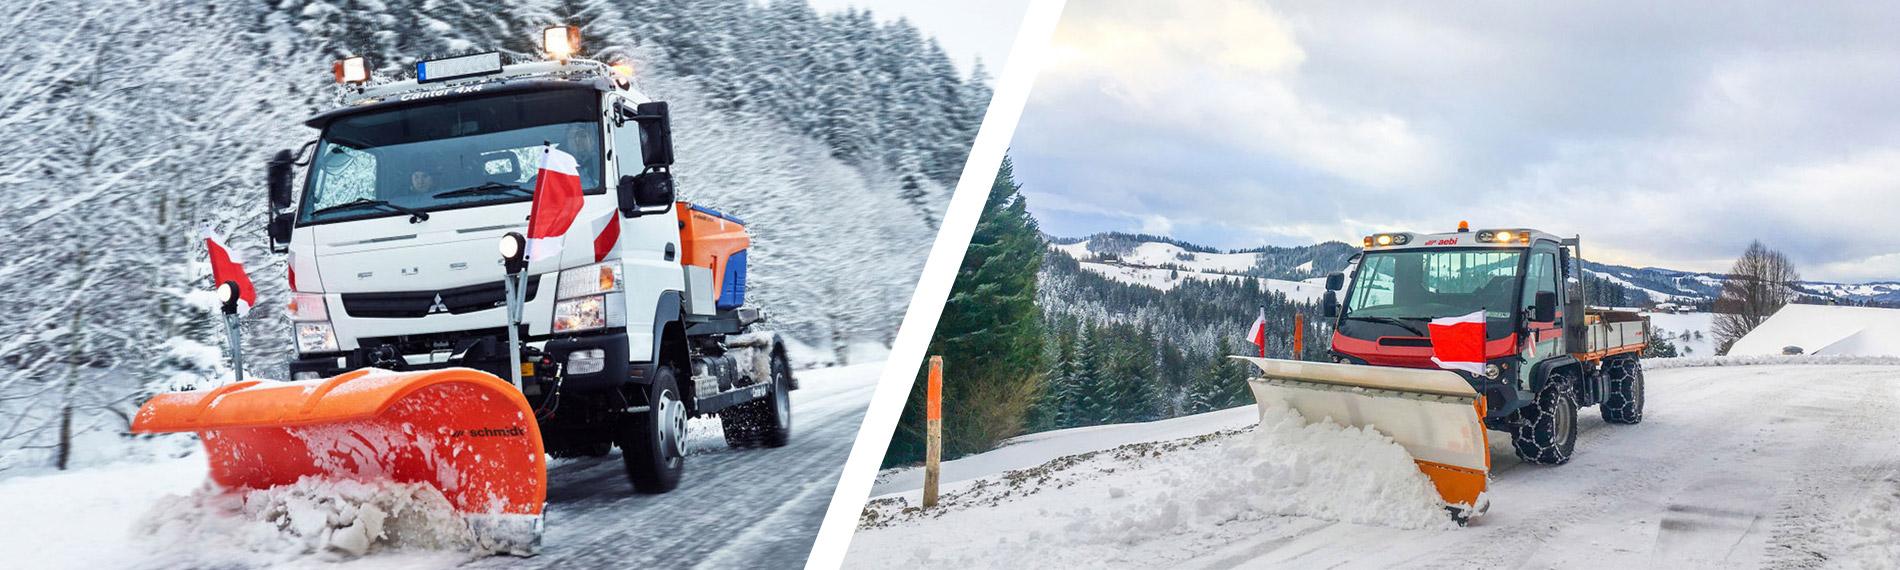 header desktop schmidt gruma winterdienst fahrzeuge schnee raeumen